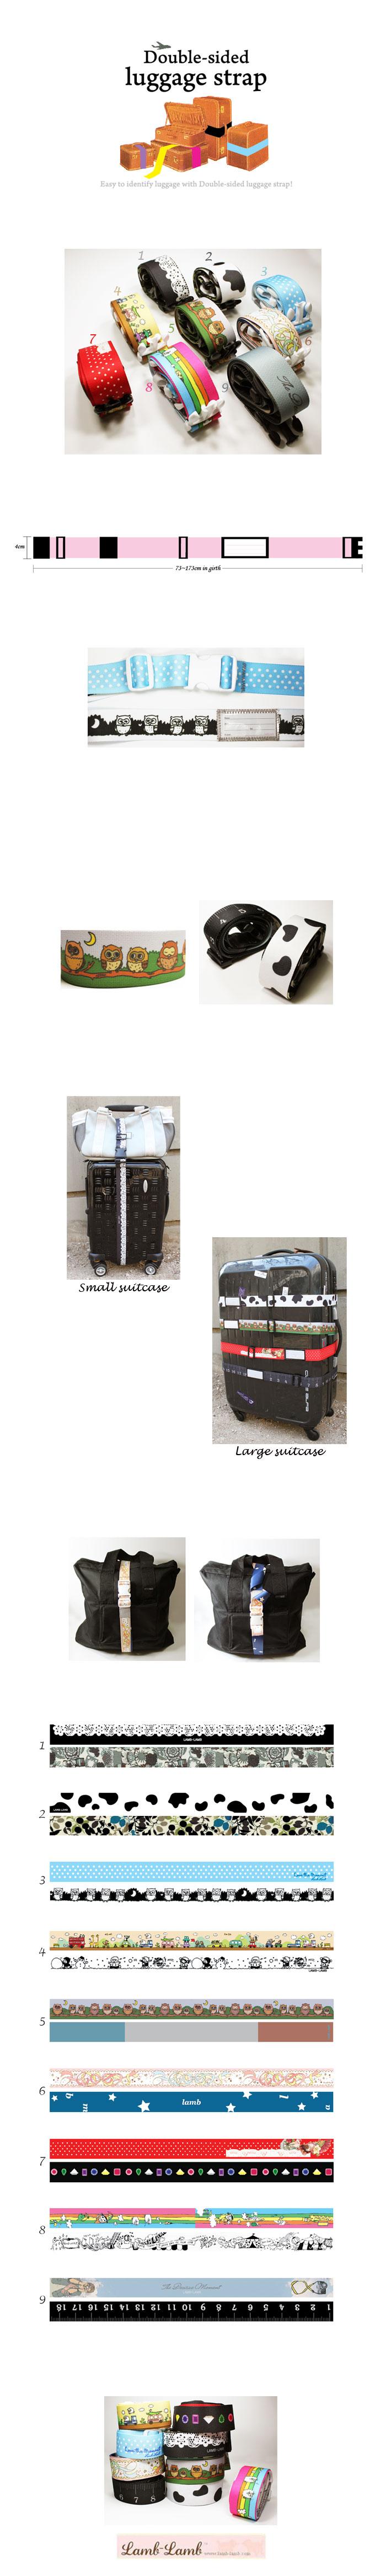 Double-sided 여행용 strap - 램램, 23,000원, 트래블팩단품, 멀티파우치